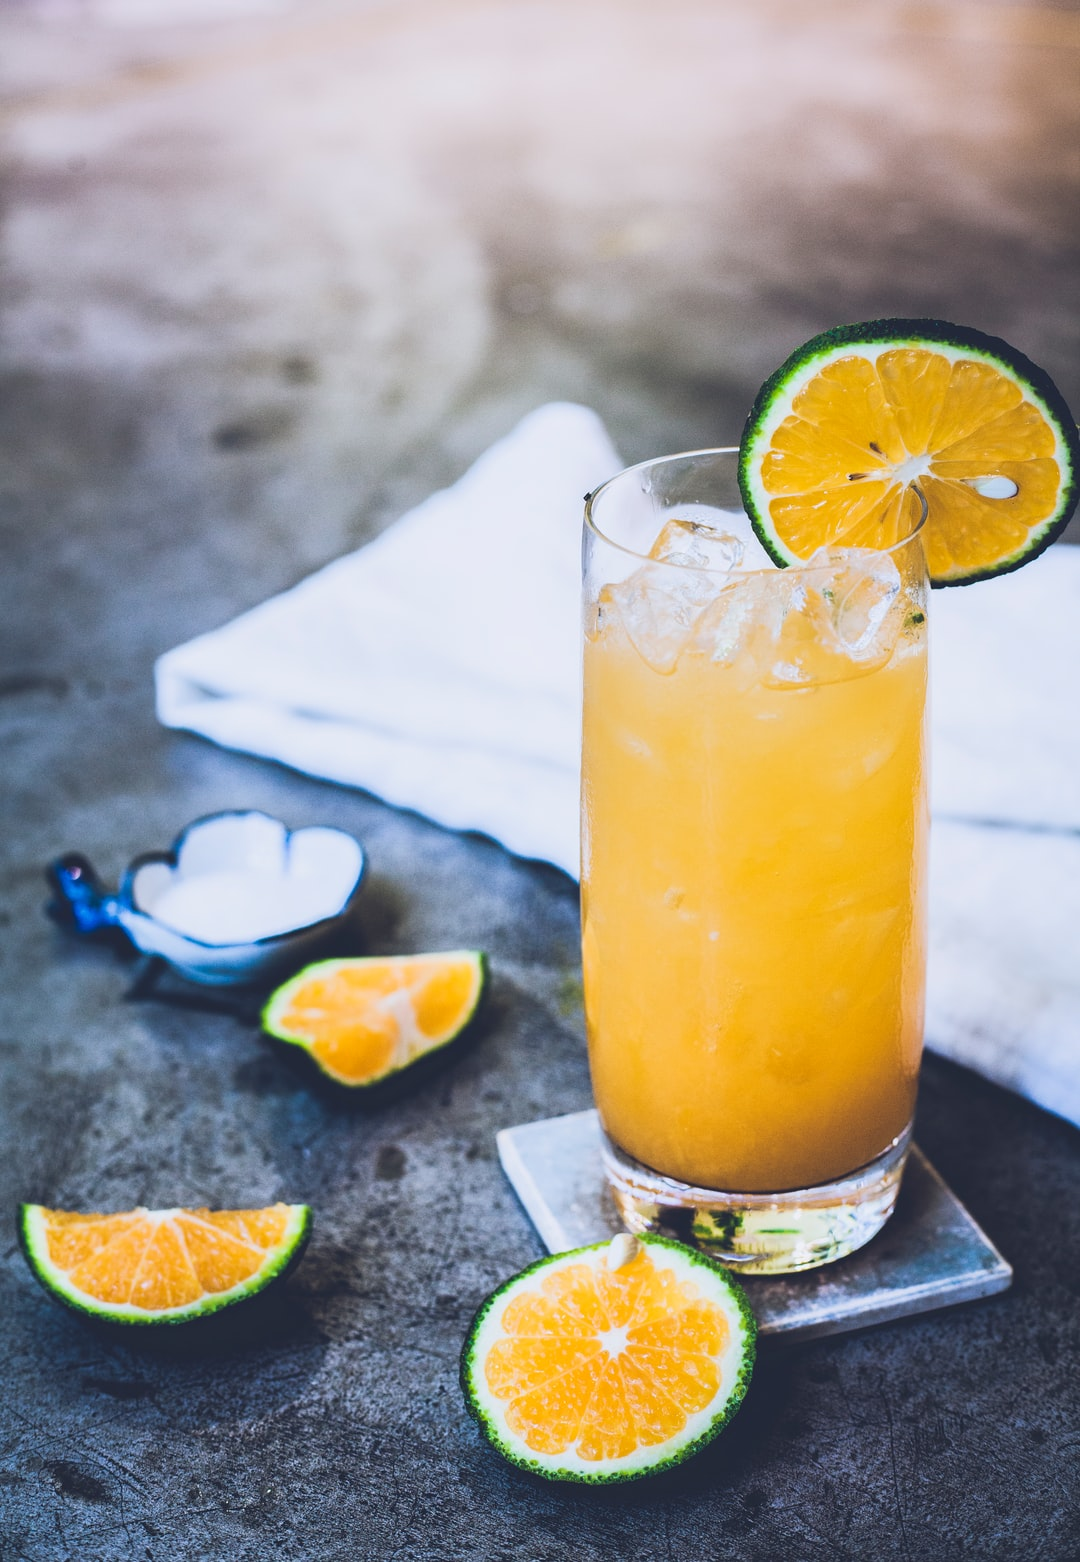 Orange Juice photo for little restaurant in Saigon